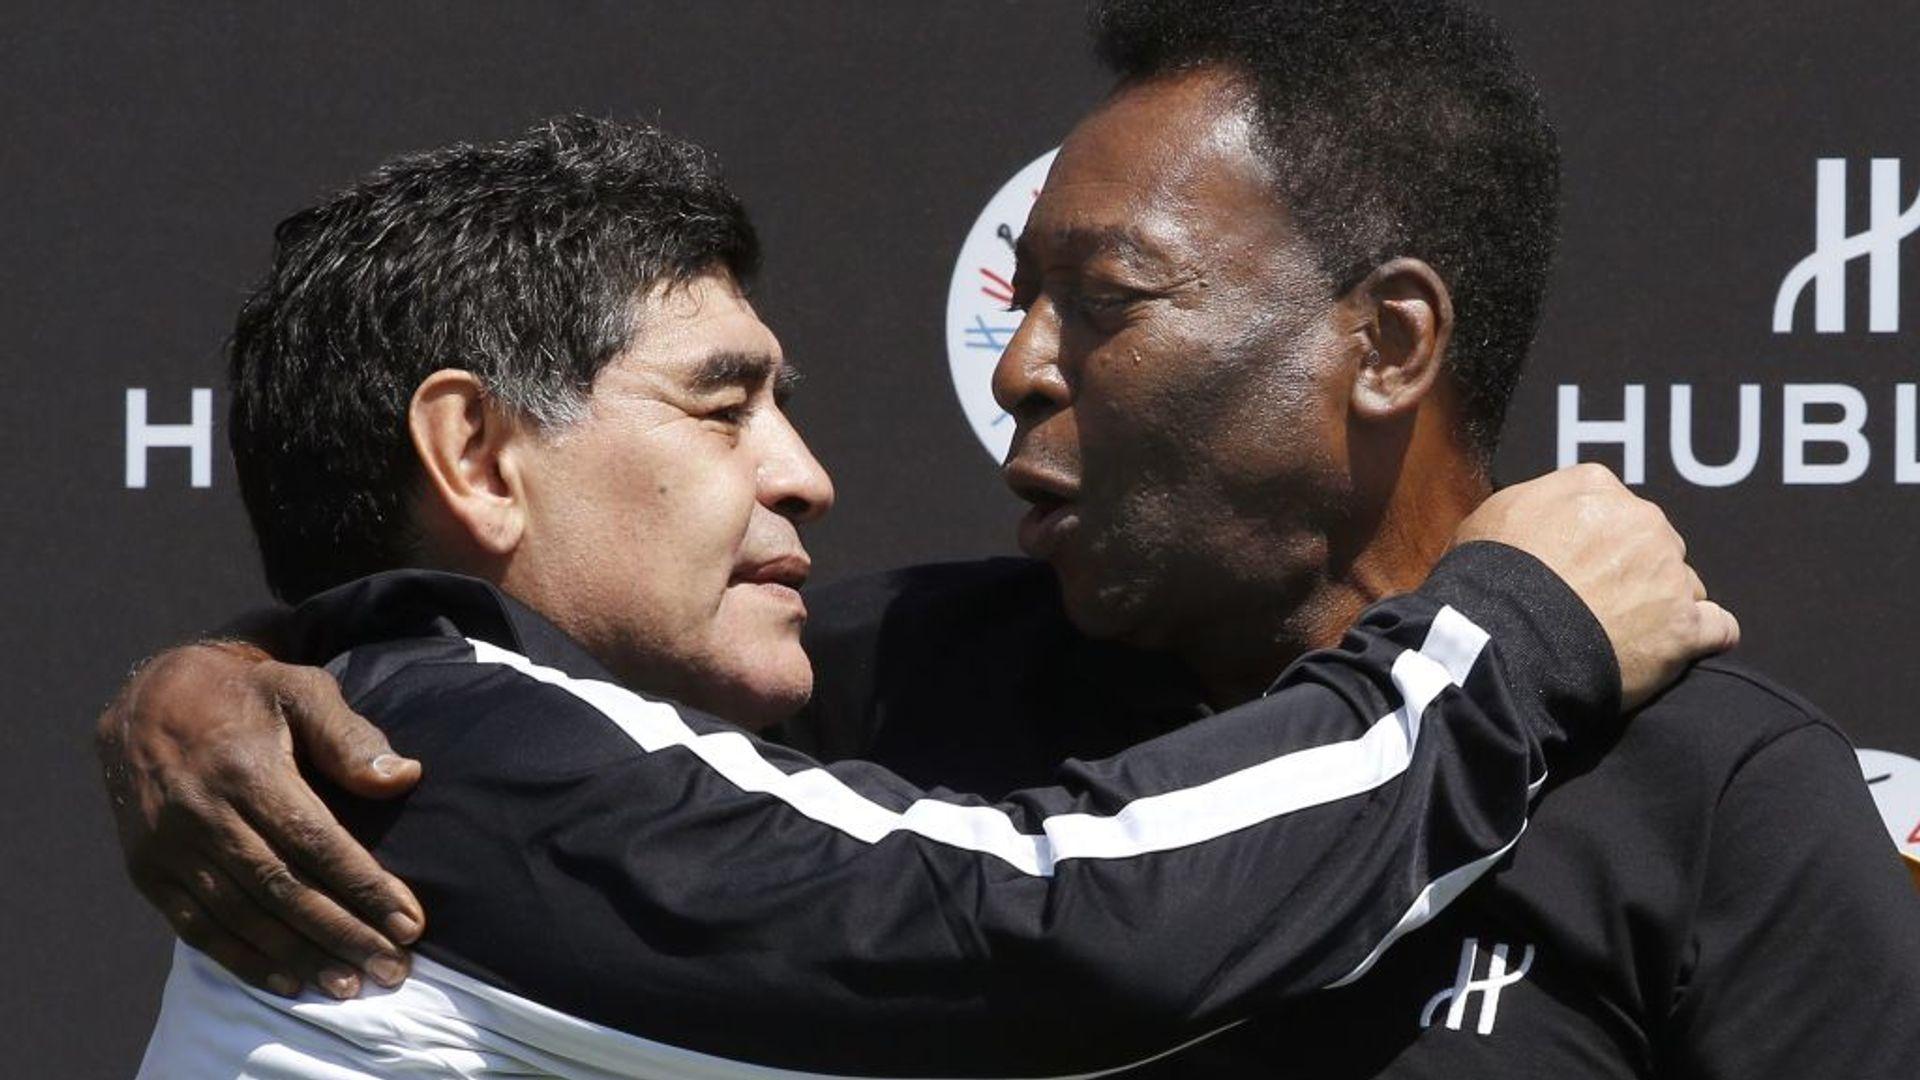 Pele: I hope to play with Maradona in the sky